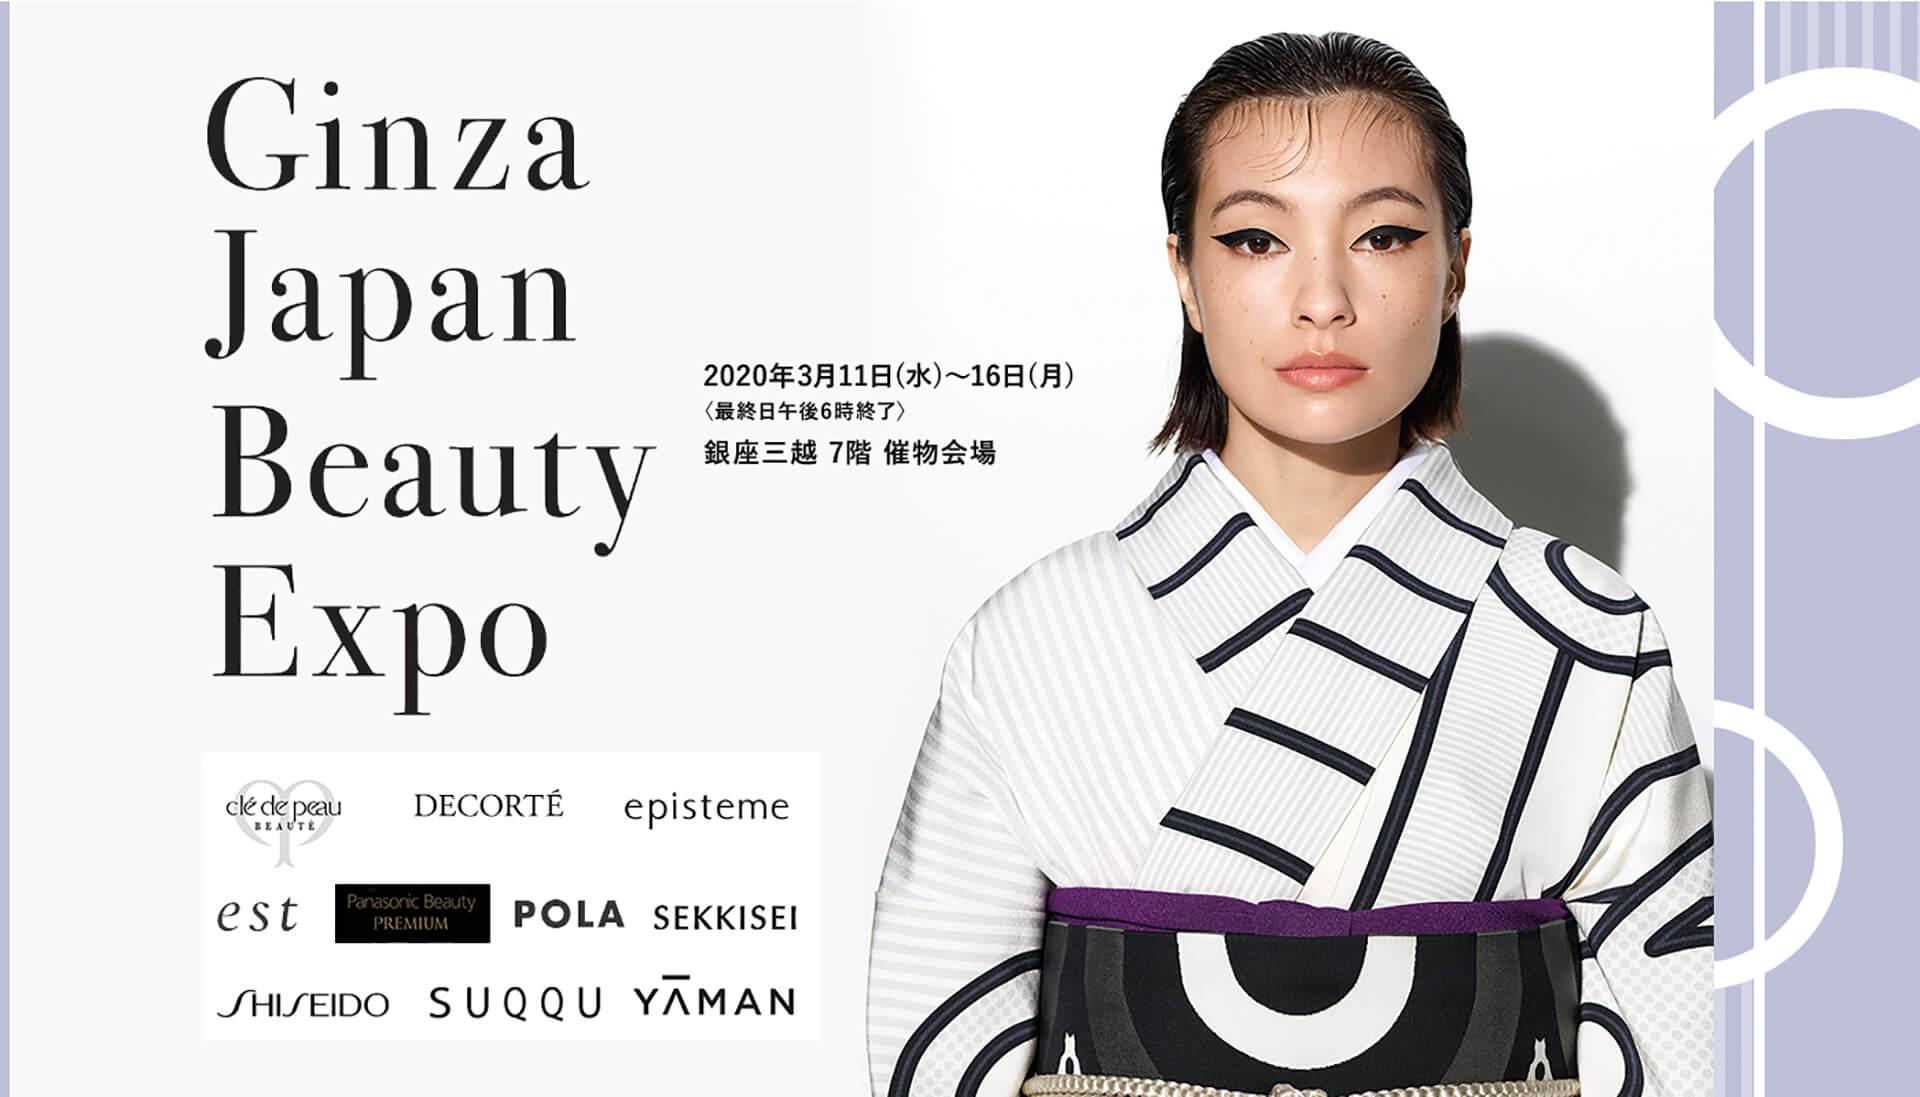 Ginza Japan Beauty Expoバナー